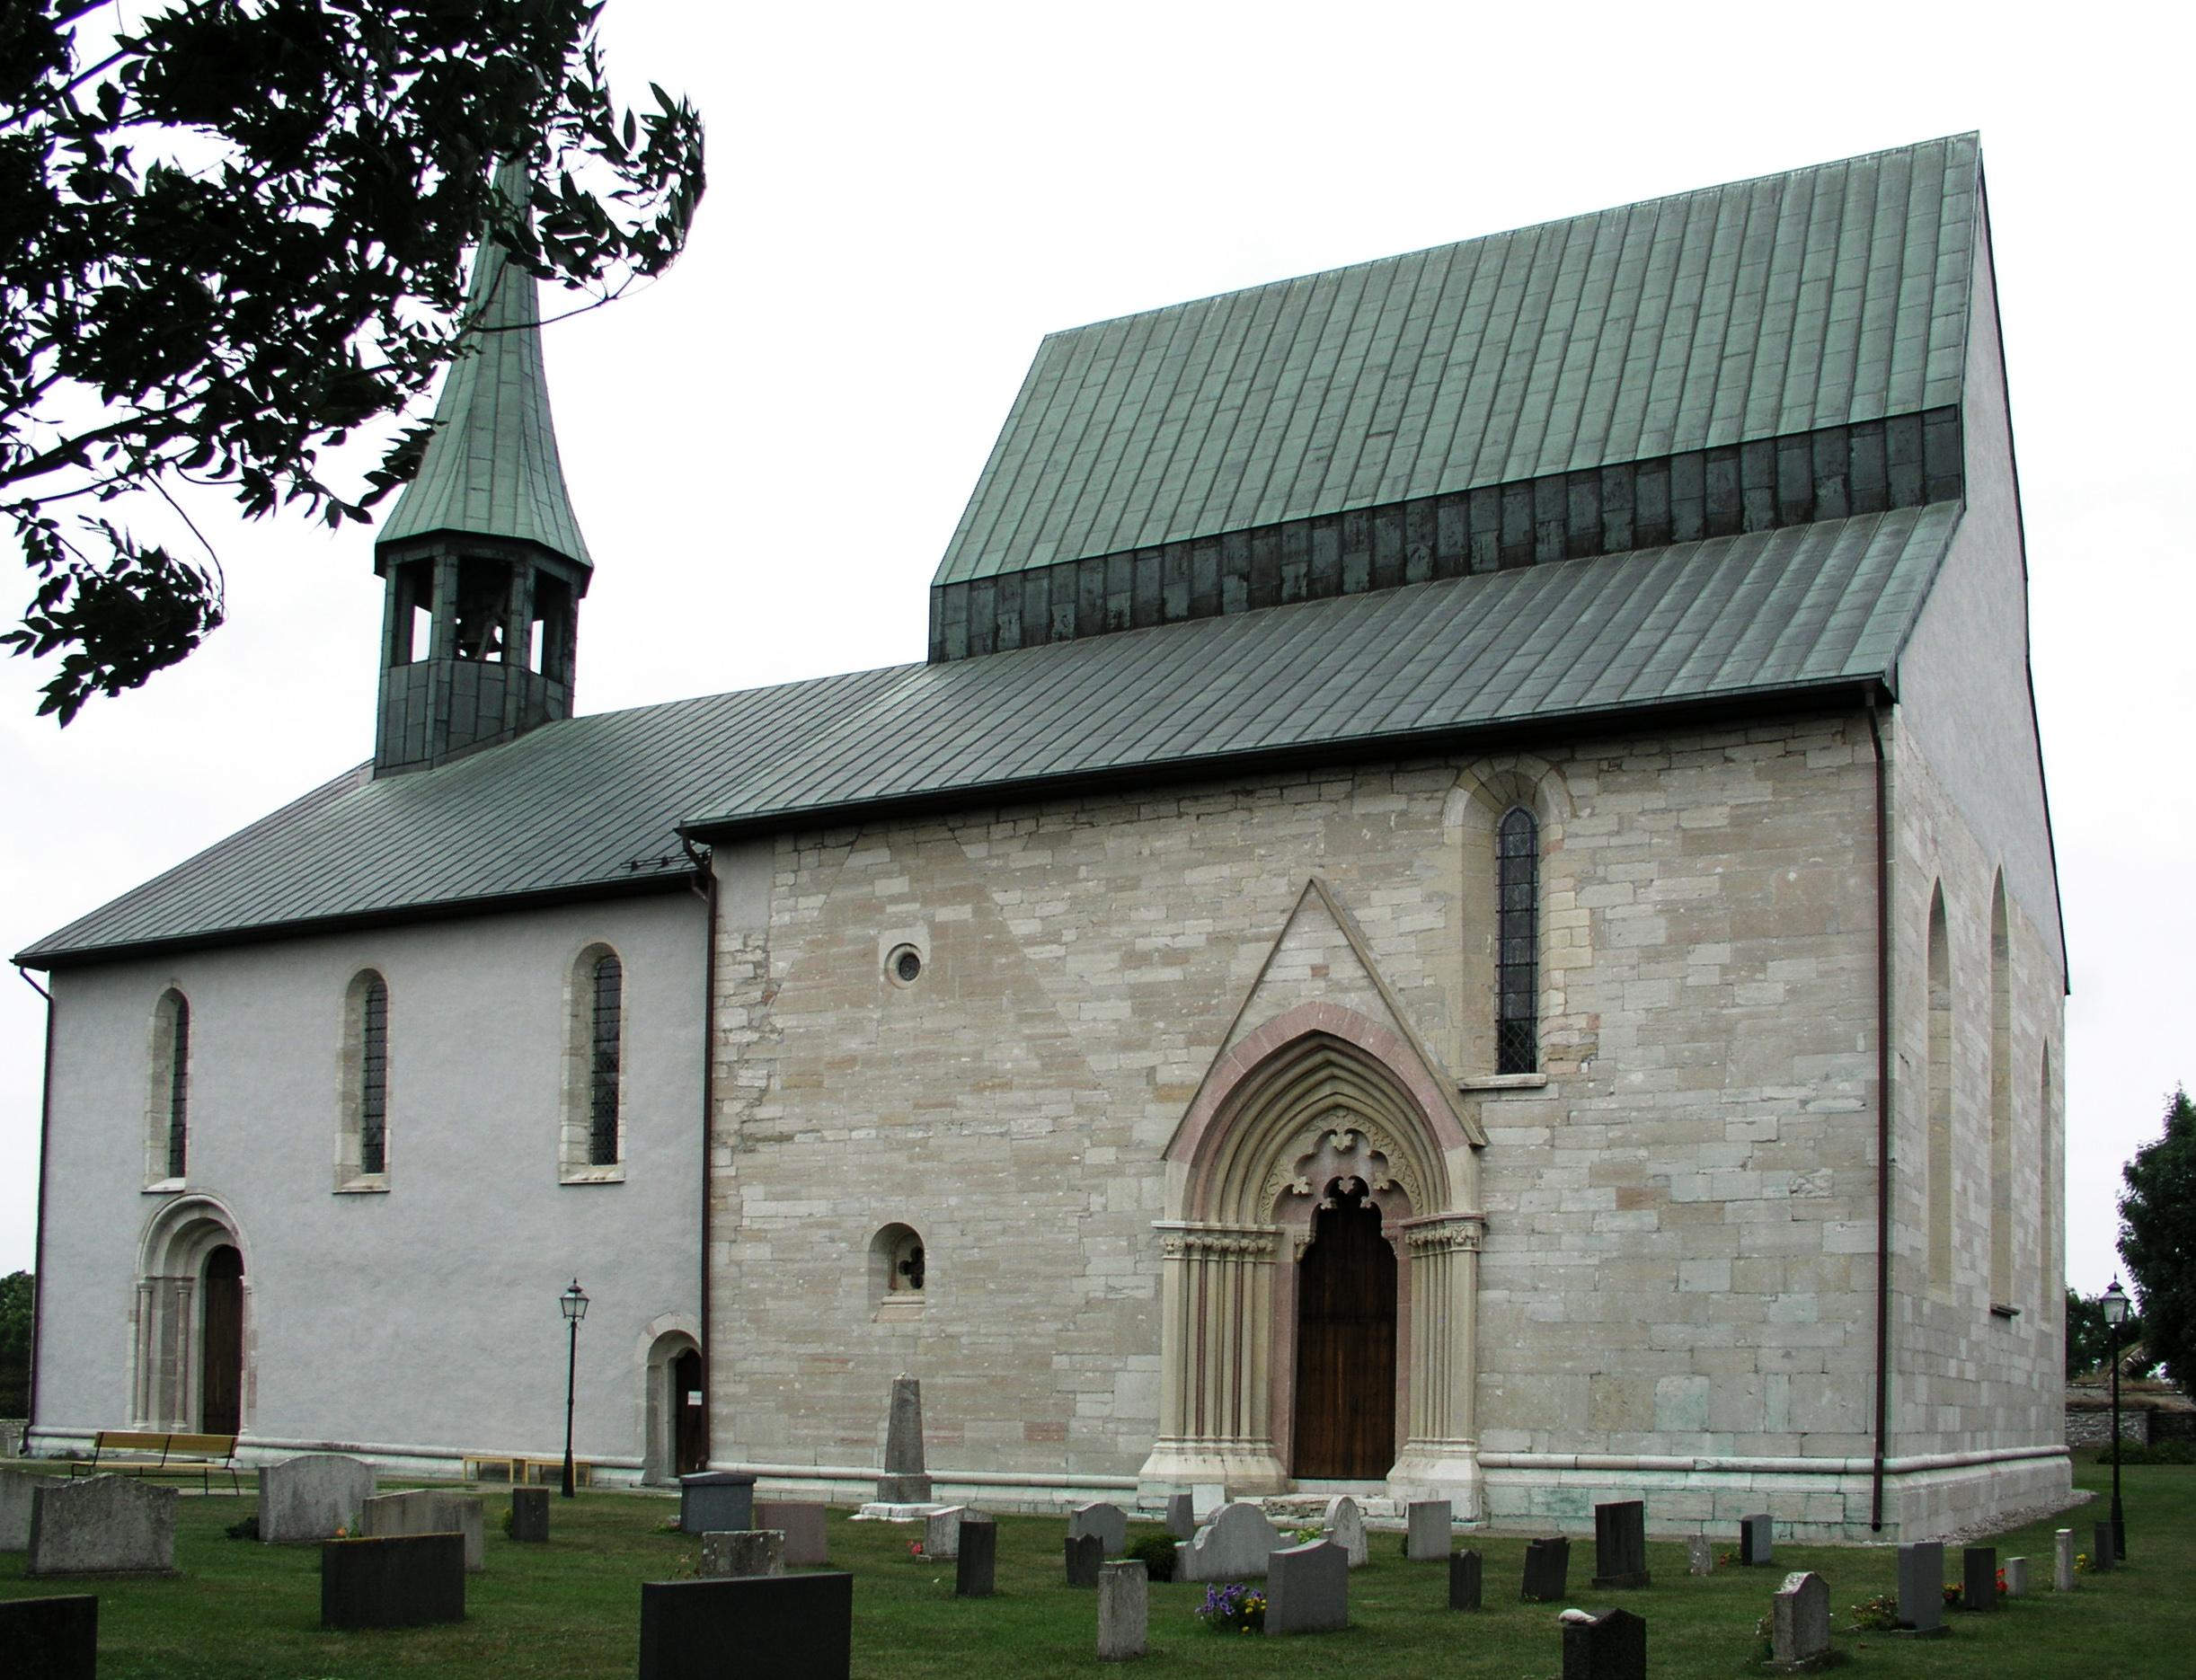 Bro Church, Gotland - Wikipedia